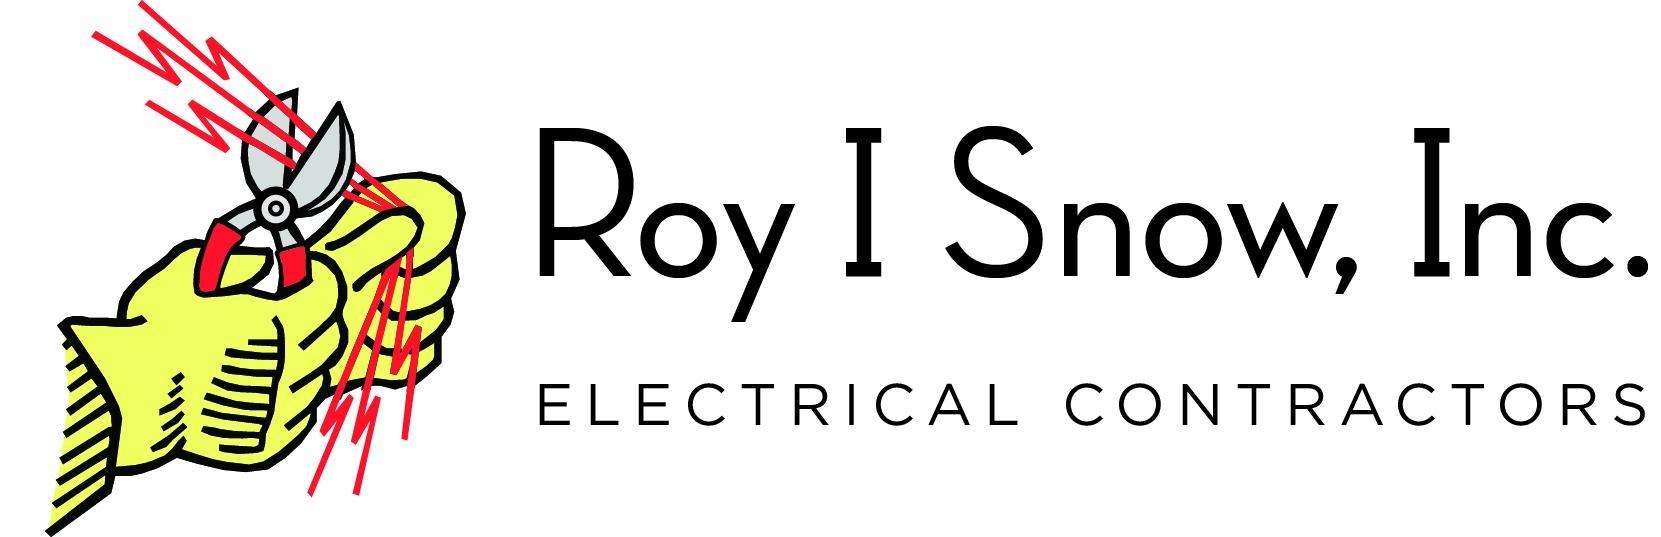 Roy I Snow, Inc.